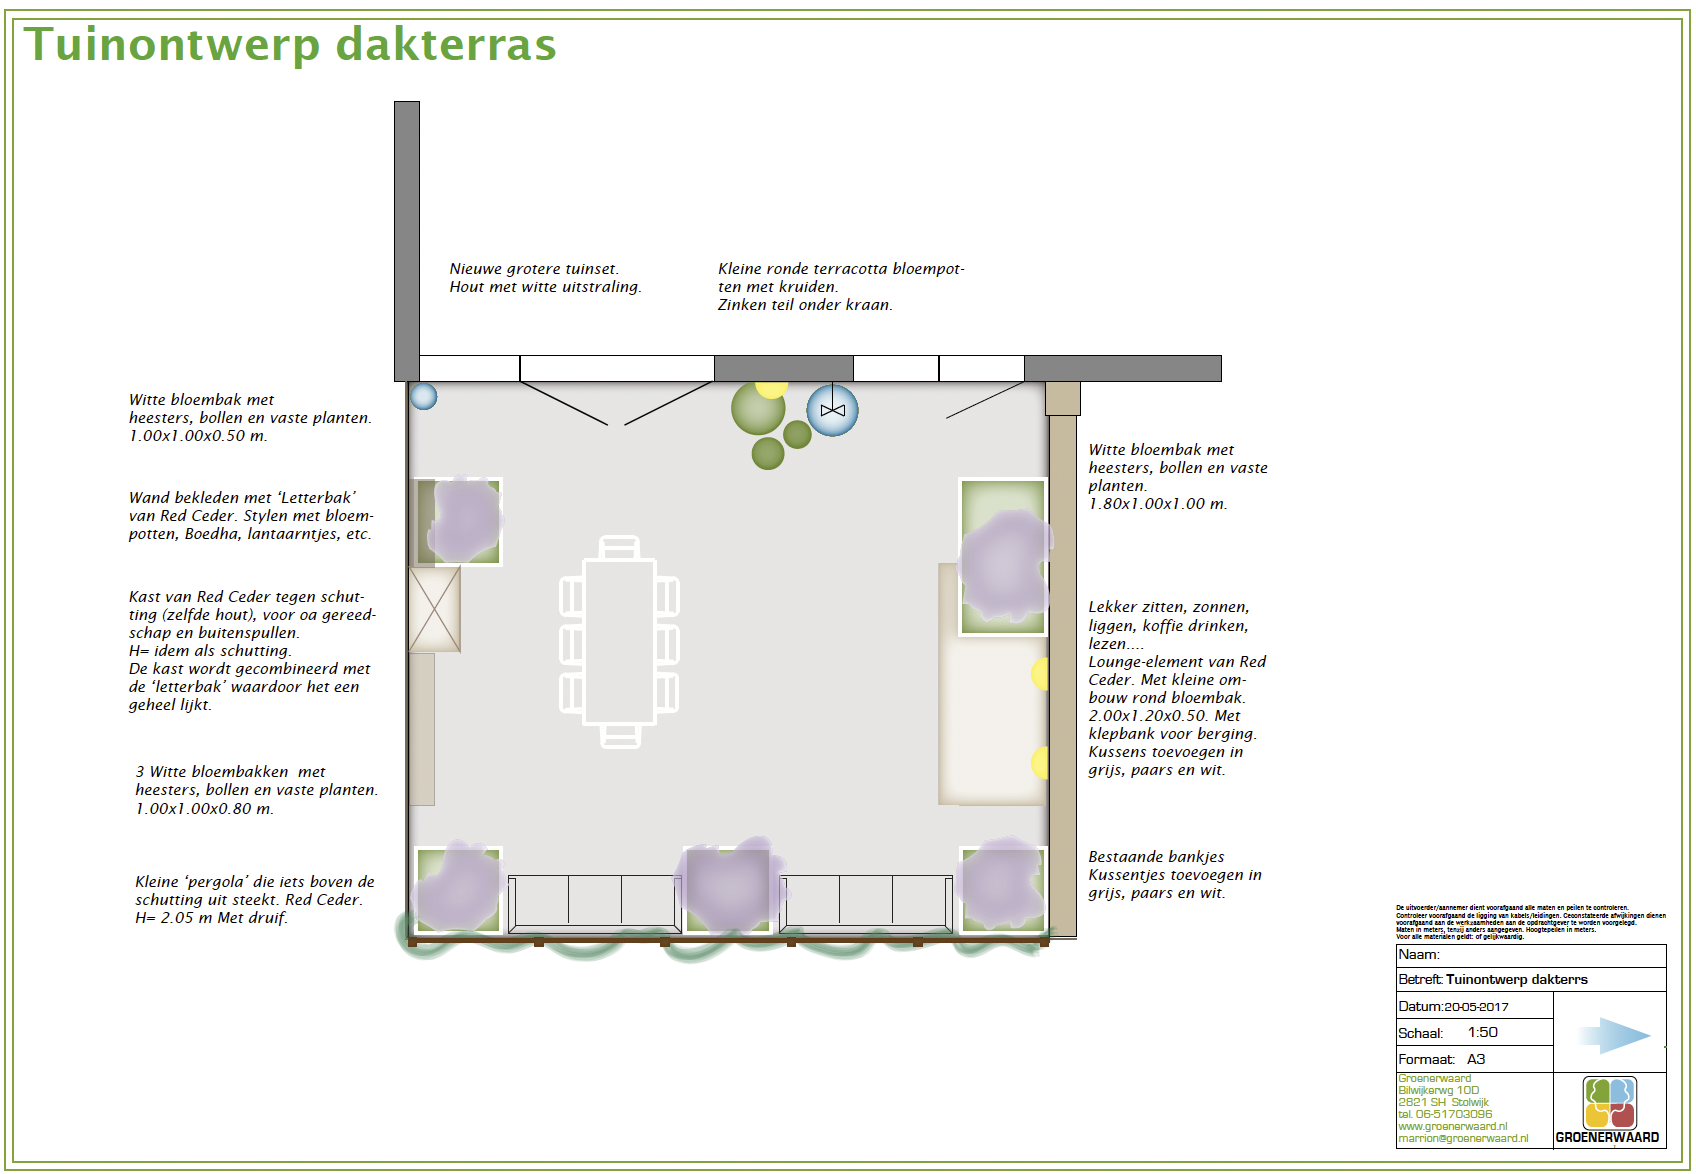 dakterras ontwerp tuin daktuin ©Groenerwaard